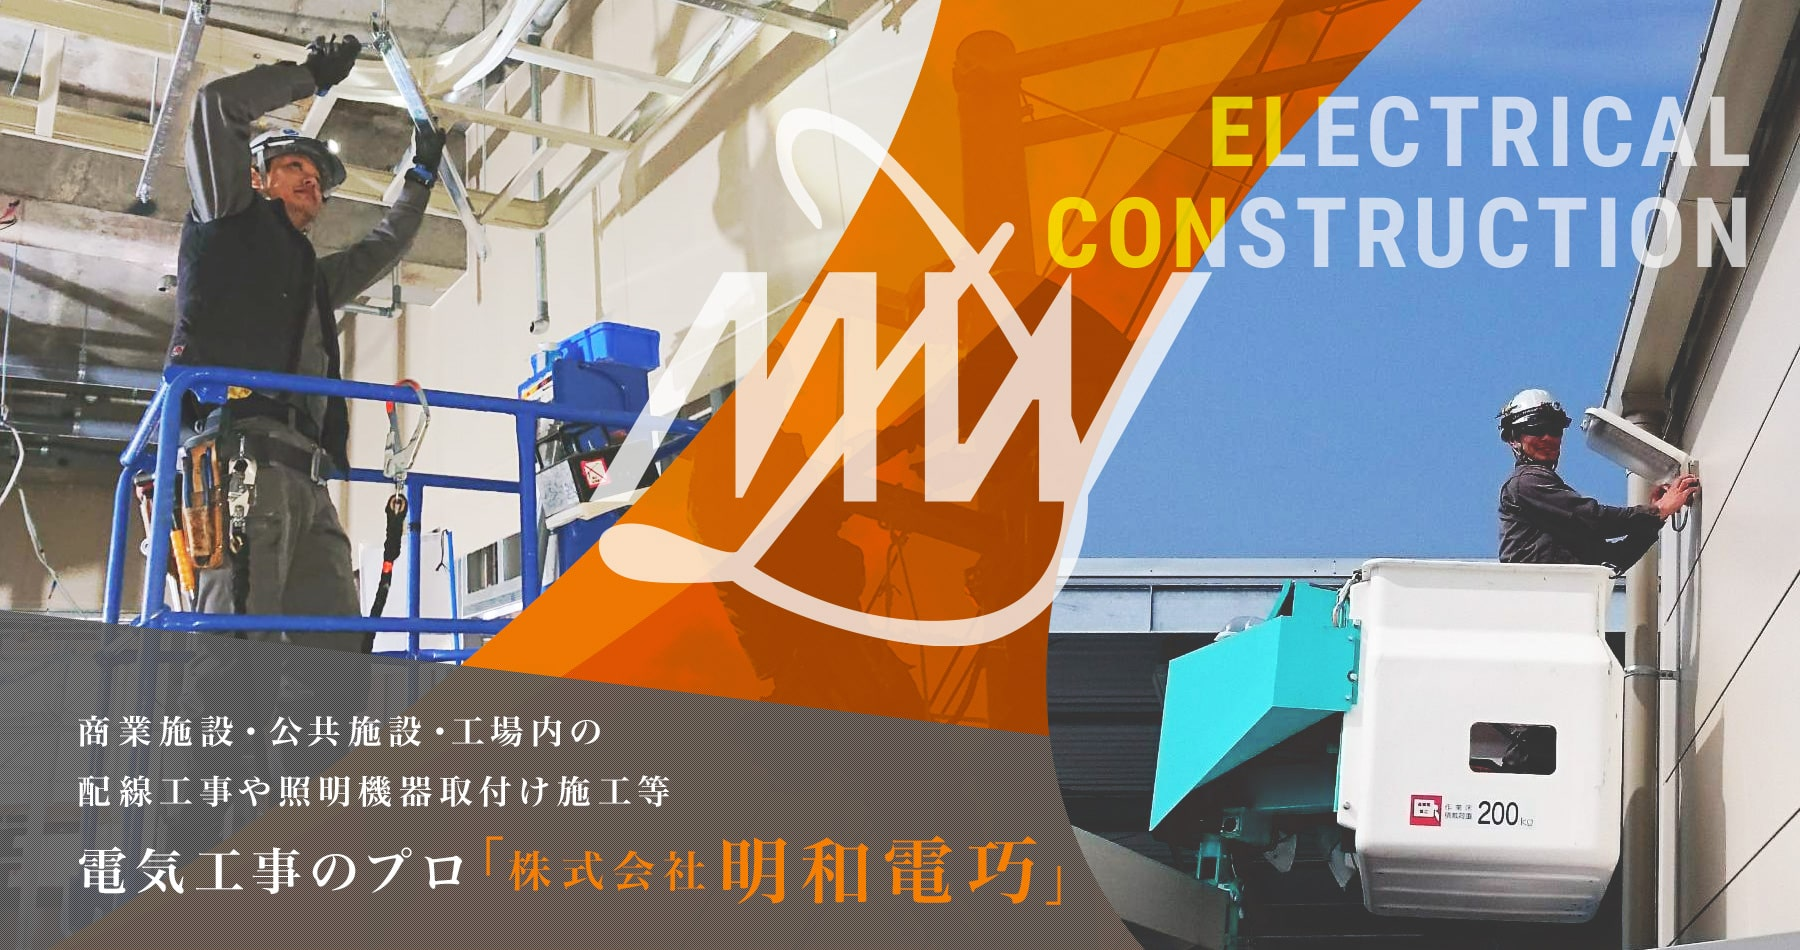 商業施設・公共施設・工場内の 配線工事や照明機器取付け施工等 電気工事のプロ「株式会社 明和電巧」